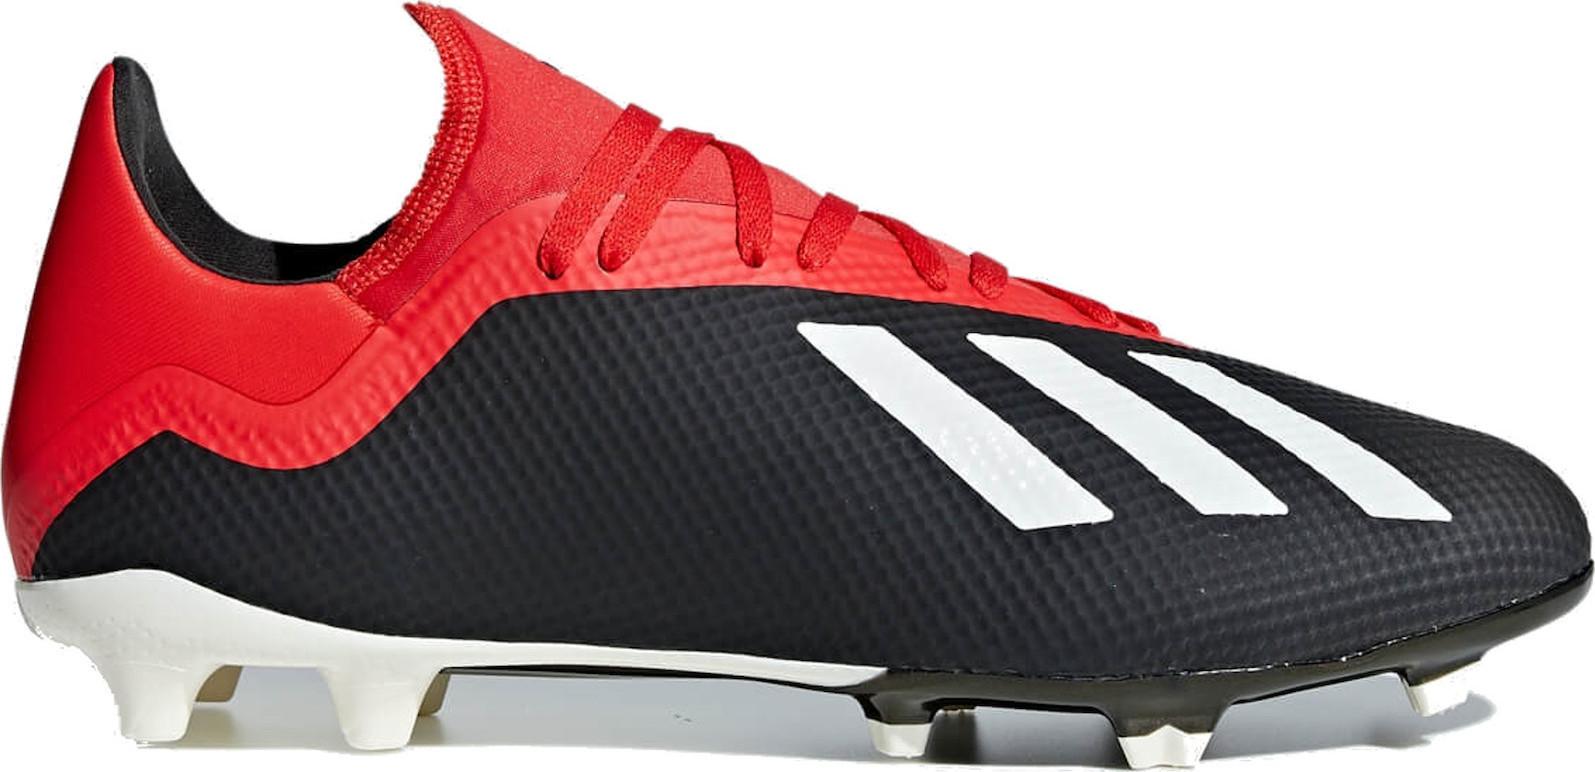 Adidas X 18.3 Firm Ground Boots BB9366